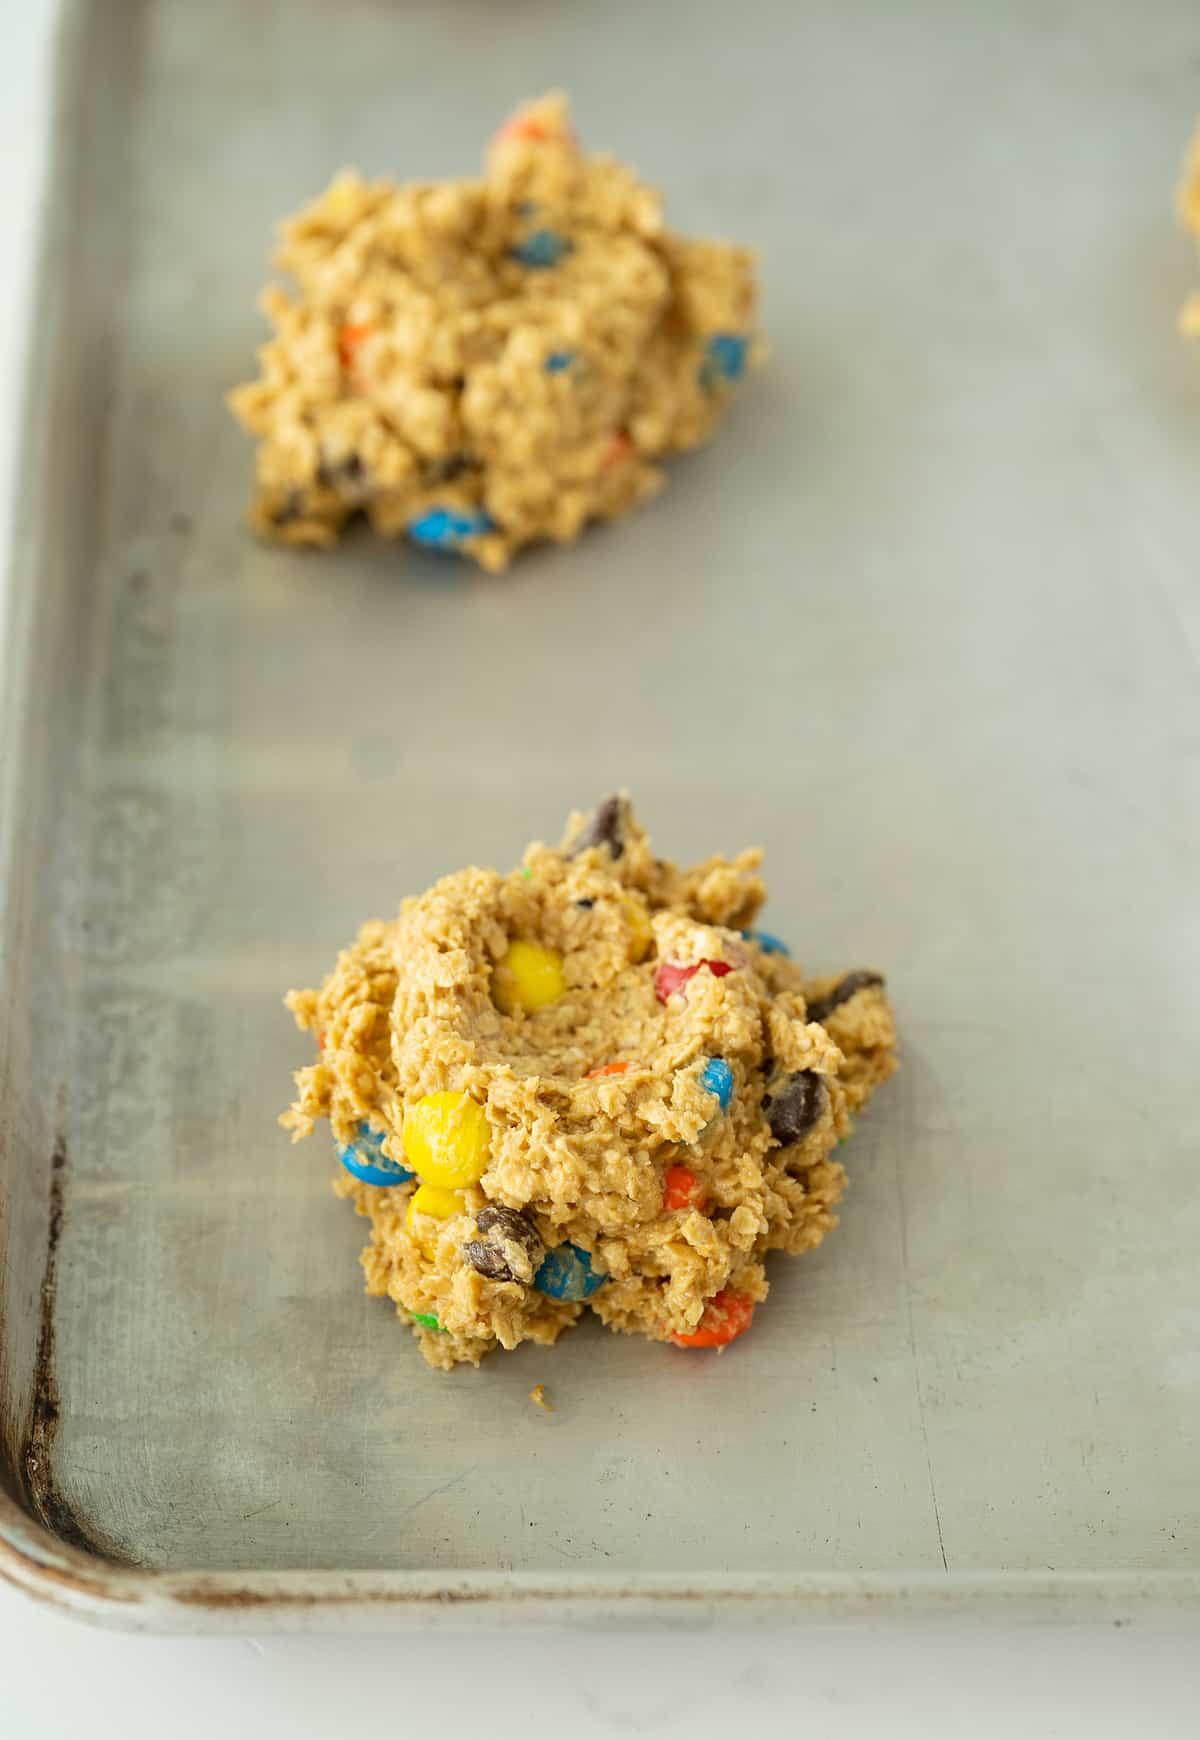 large scoop of monster cookie batter in baking sheet